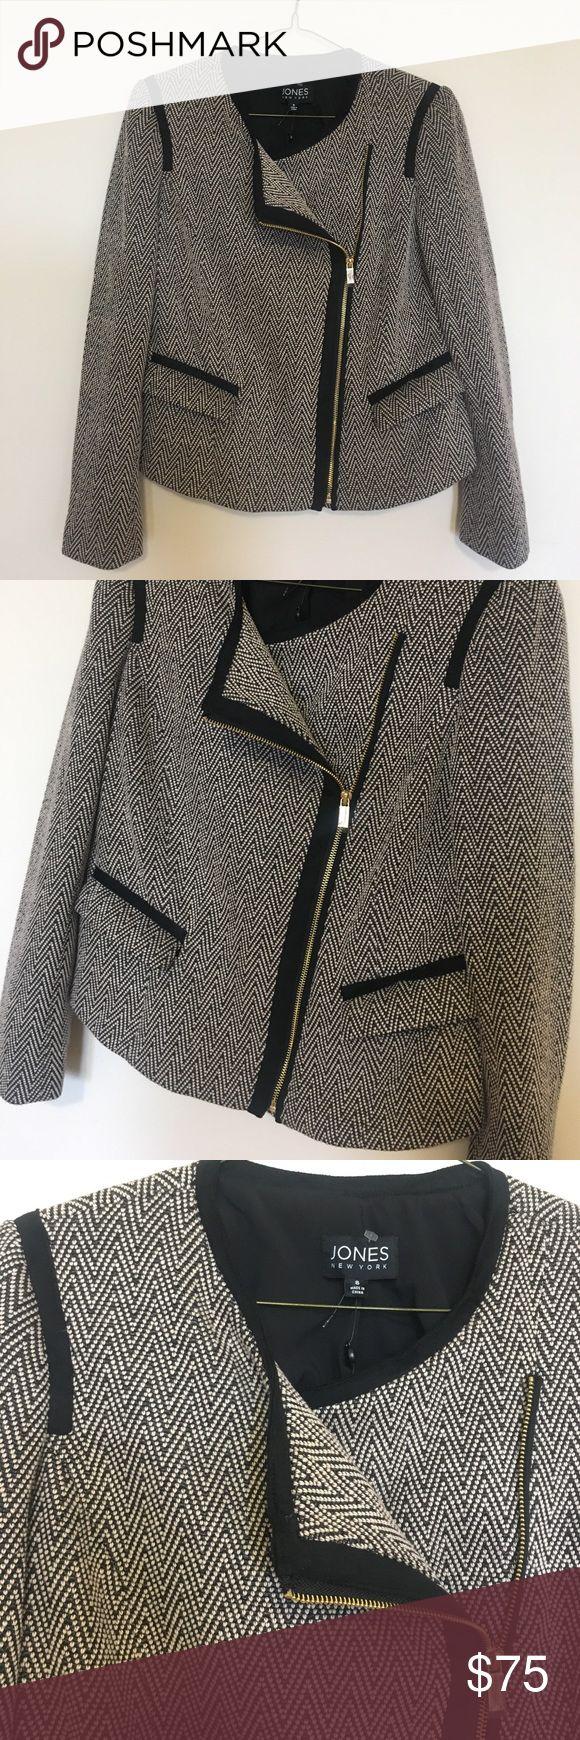 • JONES New York camel Herringbone jacket size 8 • Asymmetrical herringbone jacket. Gold zipper hardware. Brand new with tags. Black and camel combo. Retail $ 149.50 no trades. Jones New York Jackets & Coats